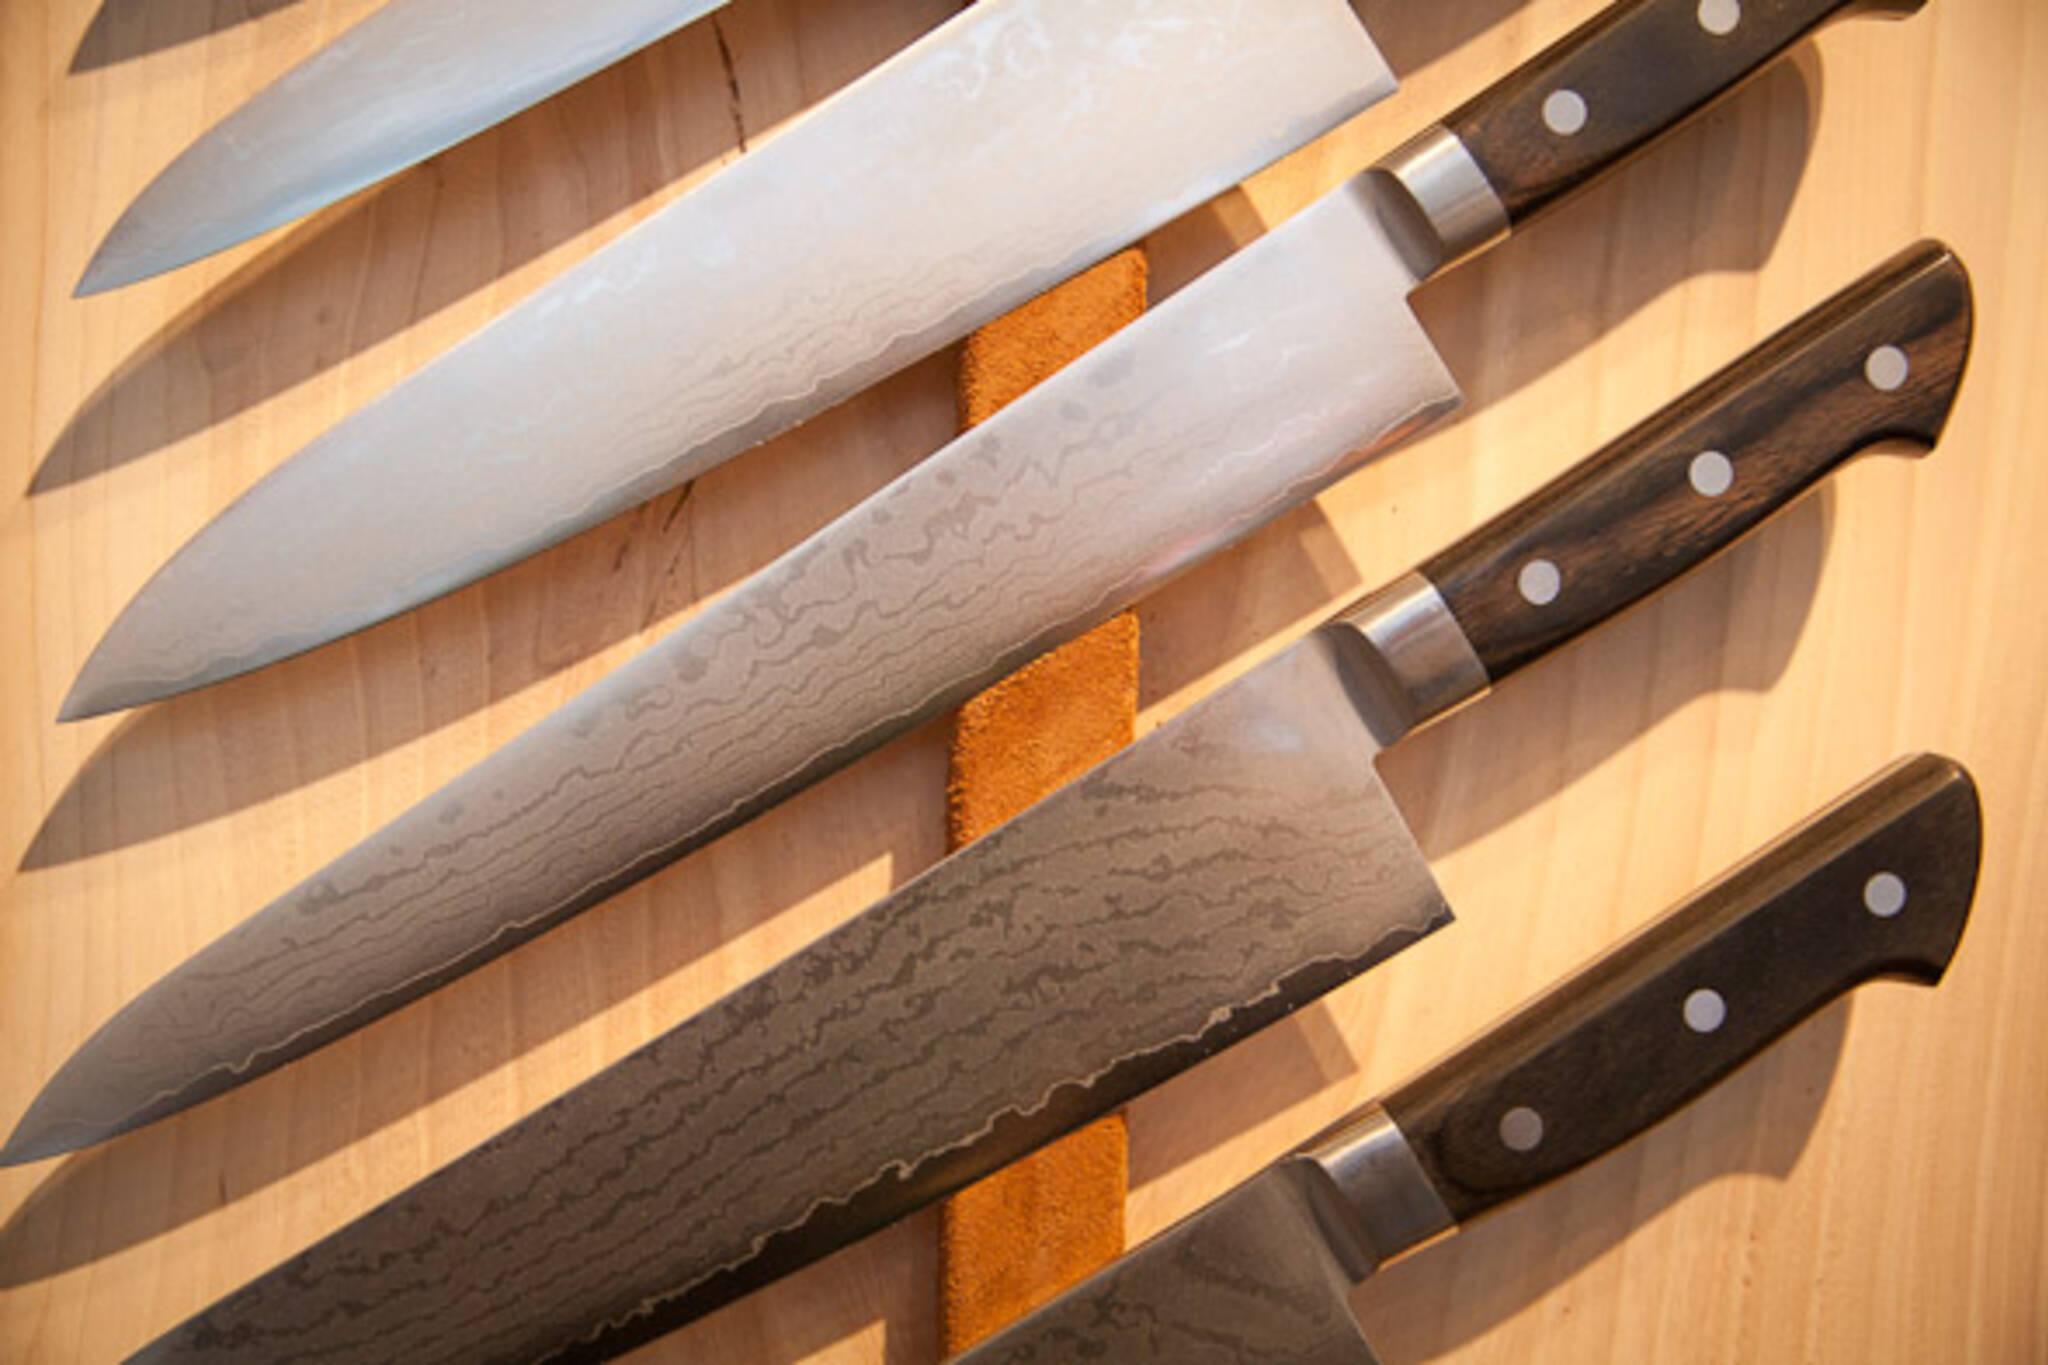 Knife boutique Toronto